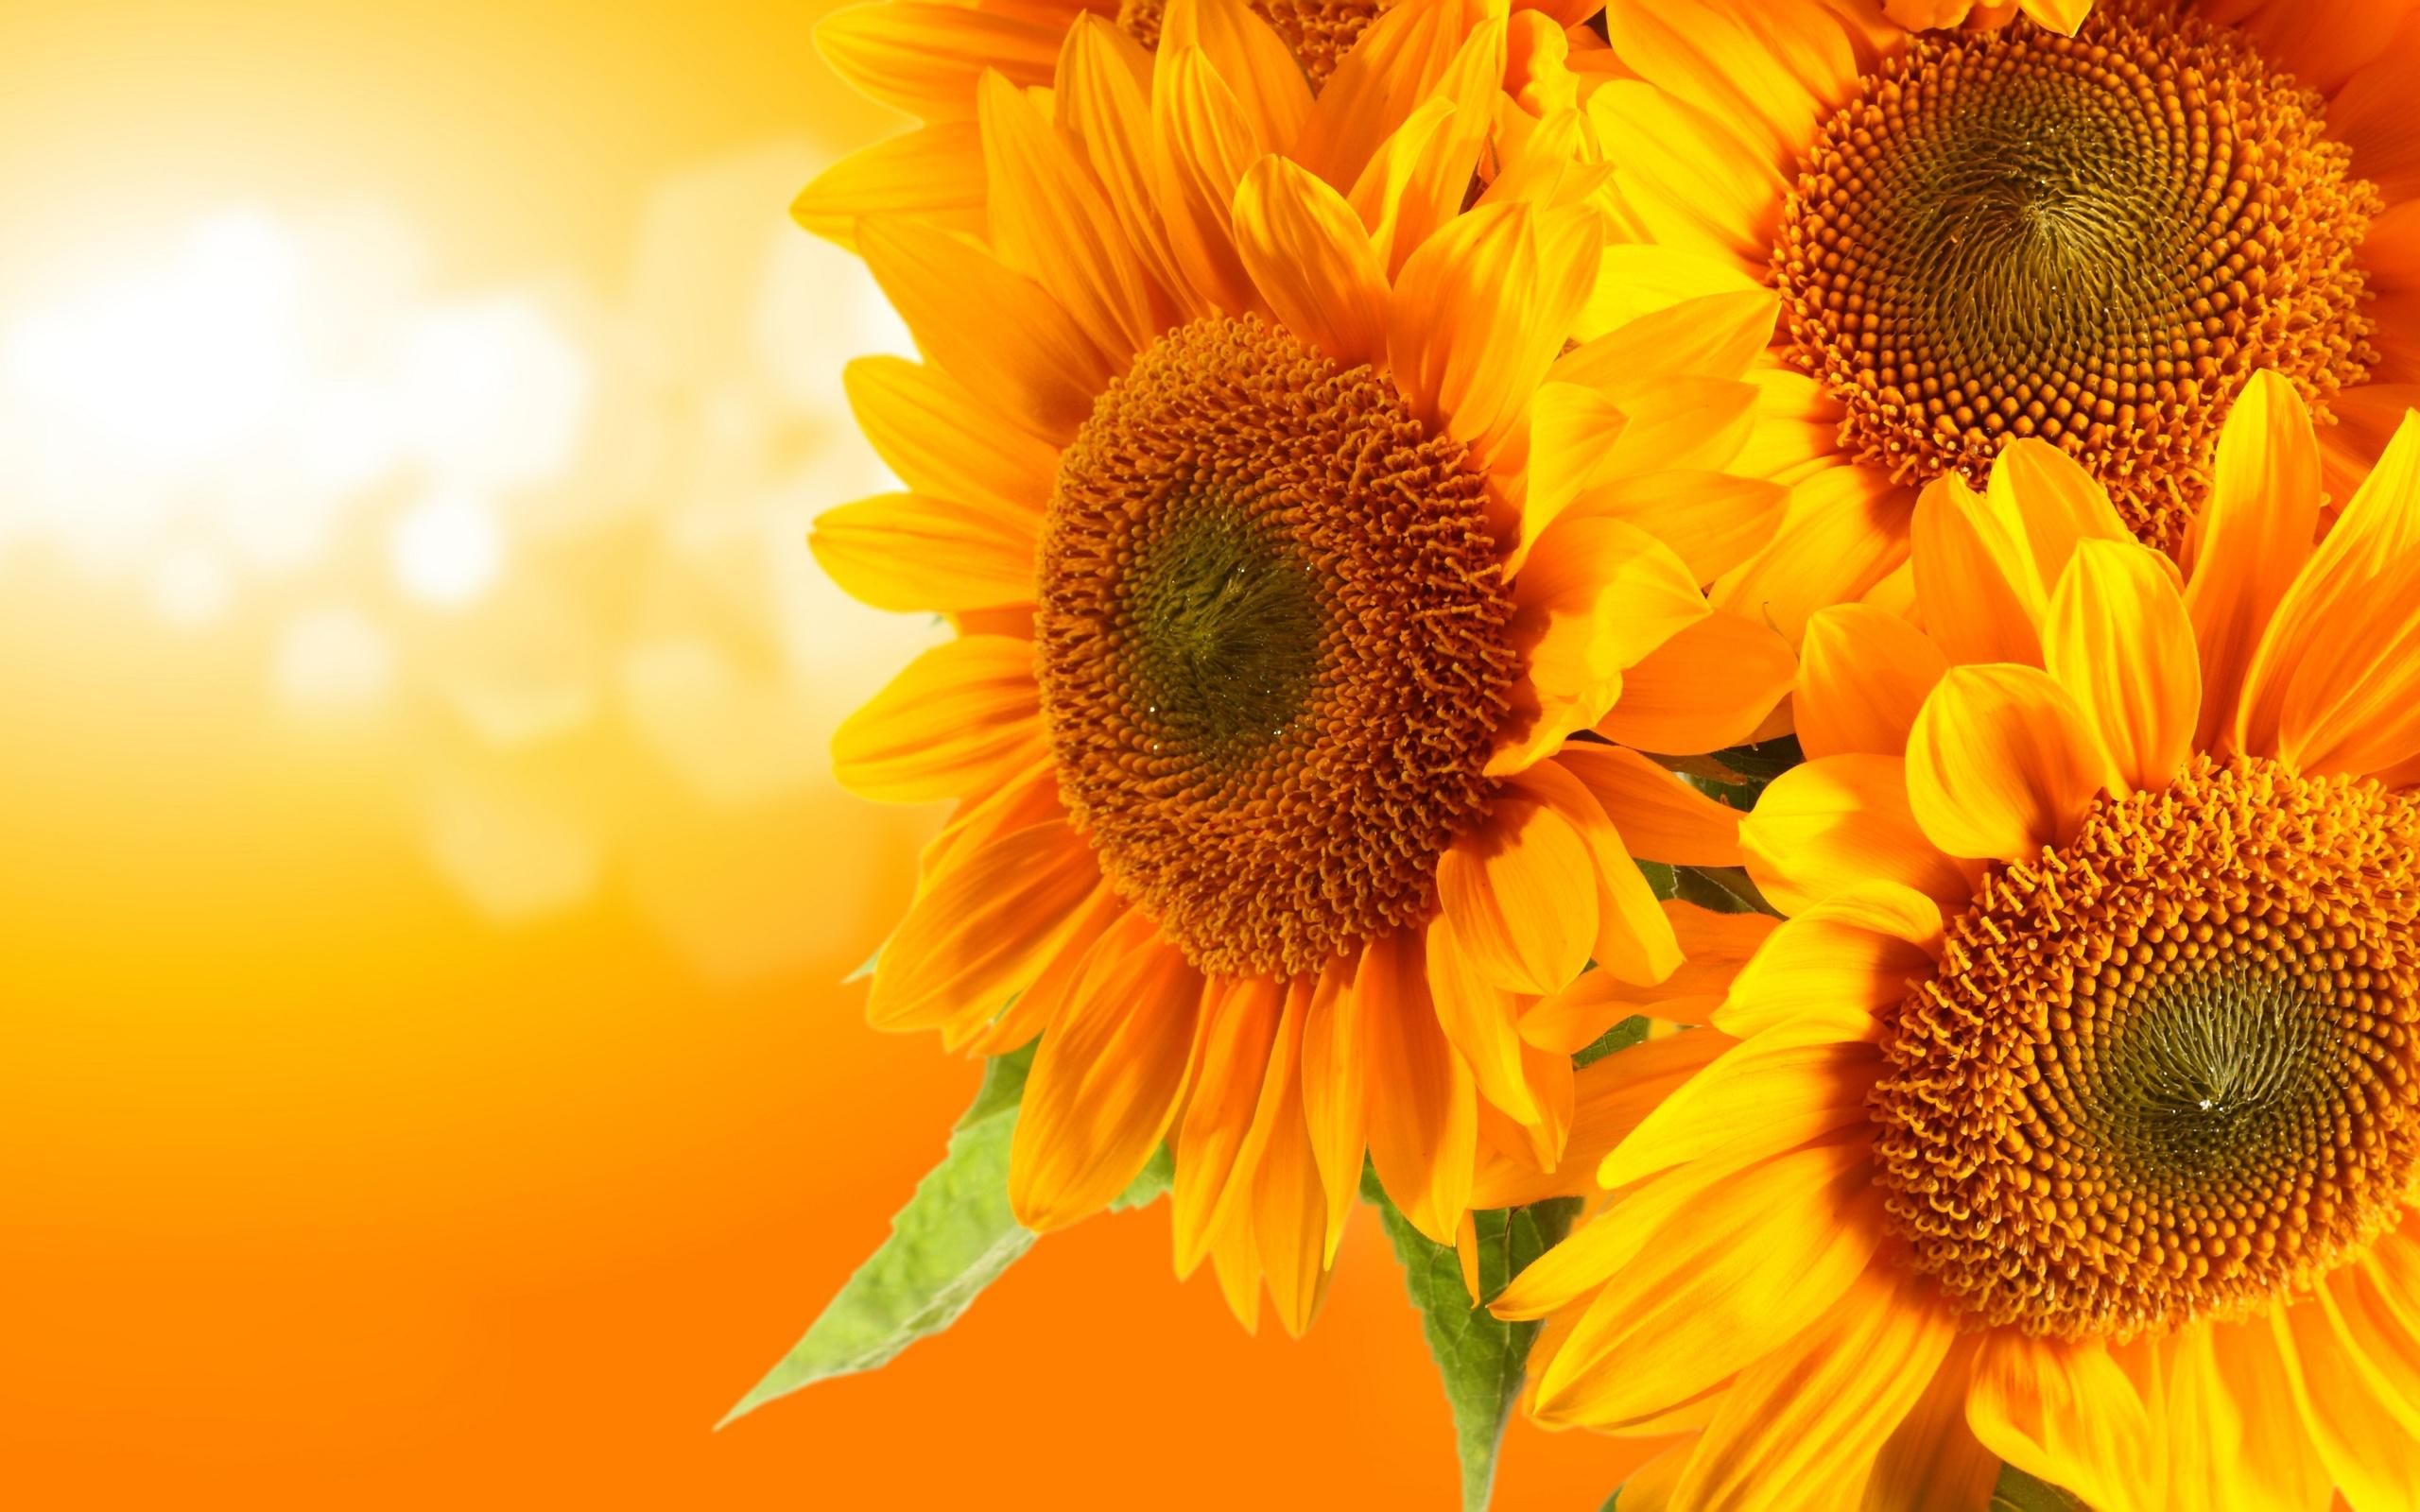 Flowers Images Orange Sunflower Wallpaper Photos 34611427